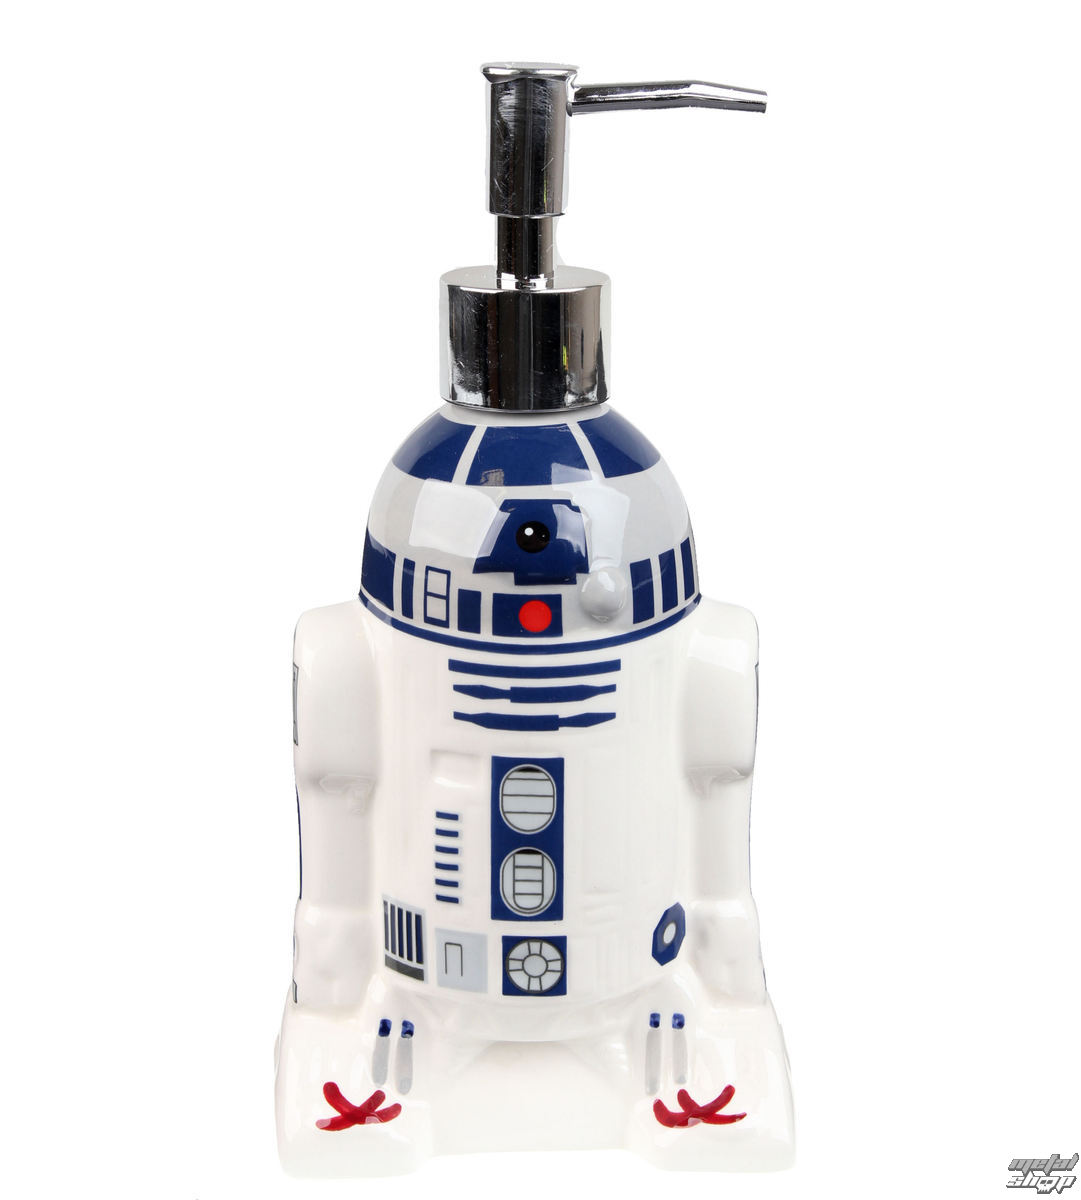 nádoba na mýdlo Star Wars - Episode VII - R2-D2 - JOY21661